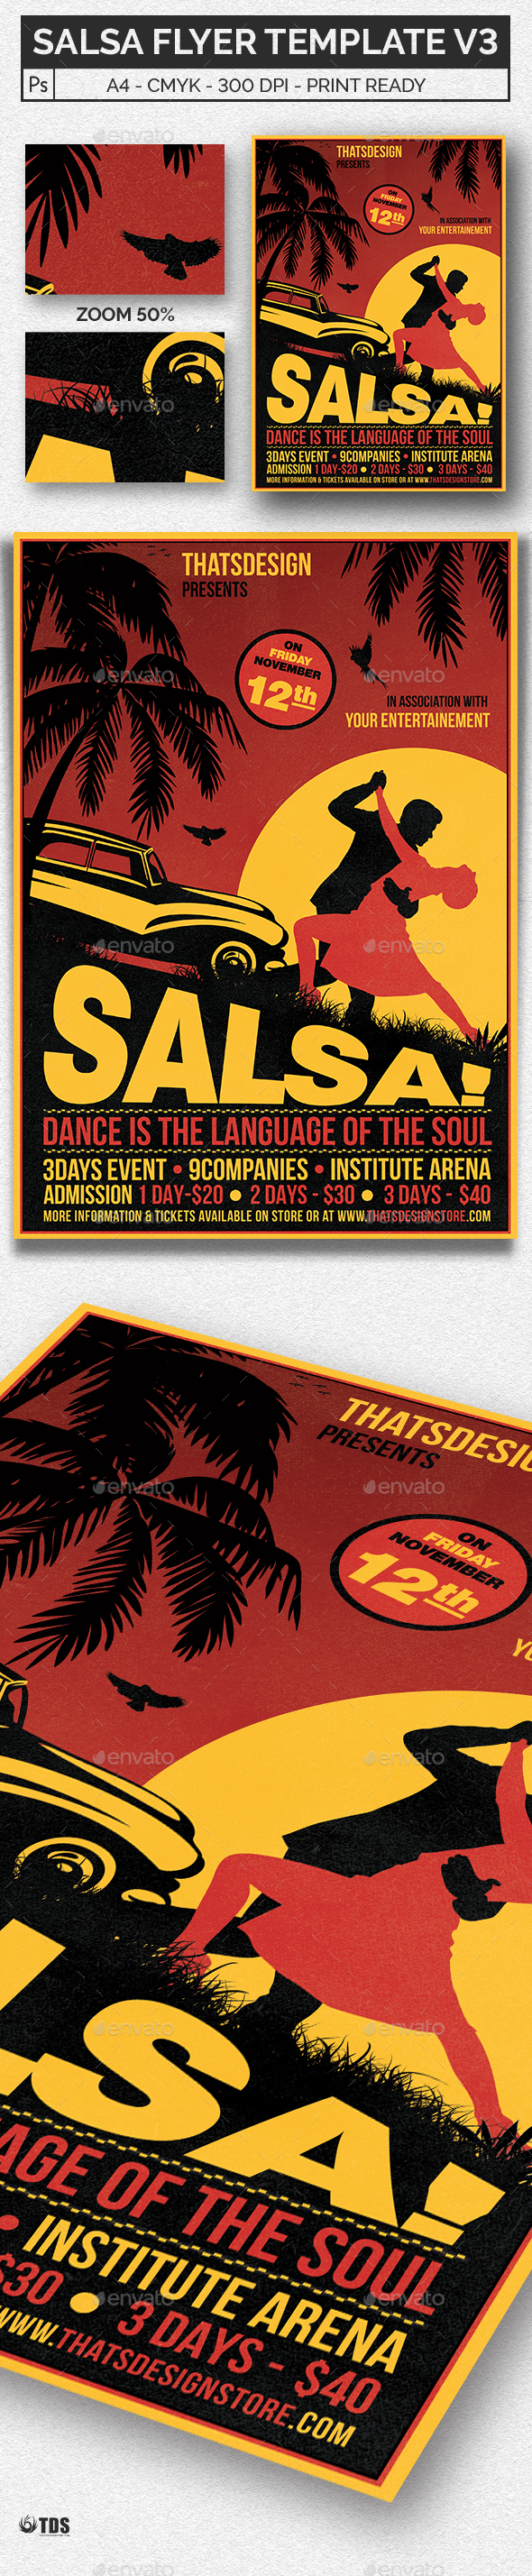 Salsa Flyer Template V3 - Events Flyers